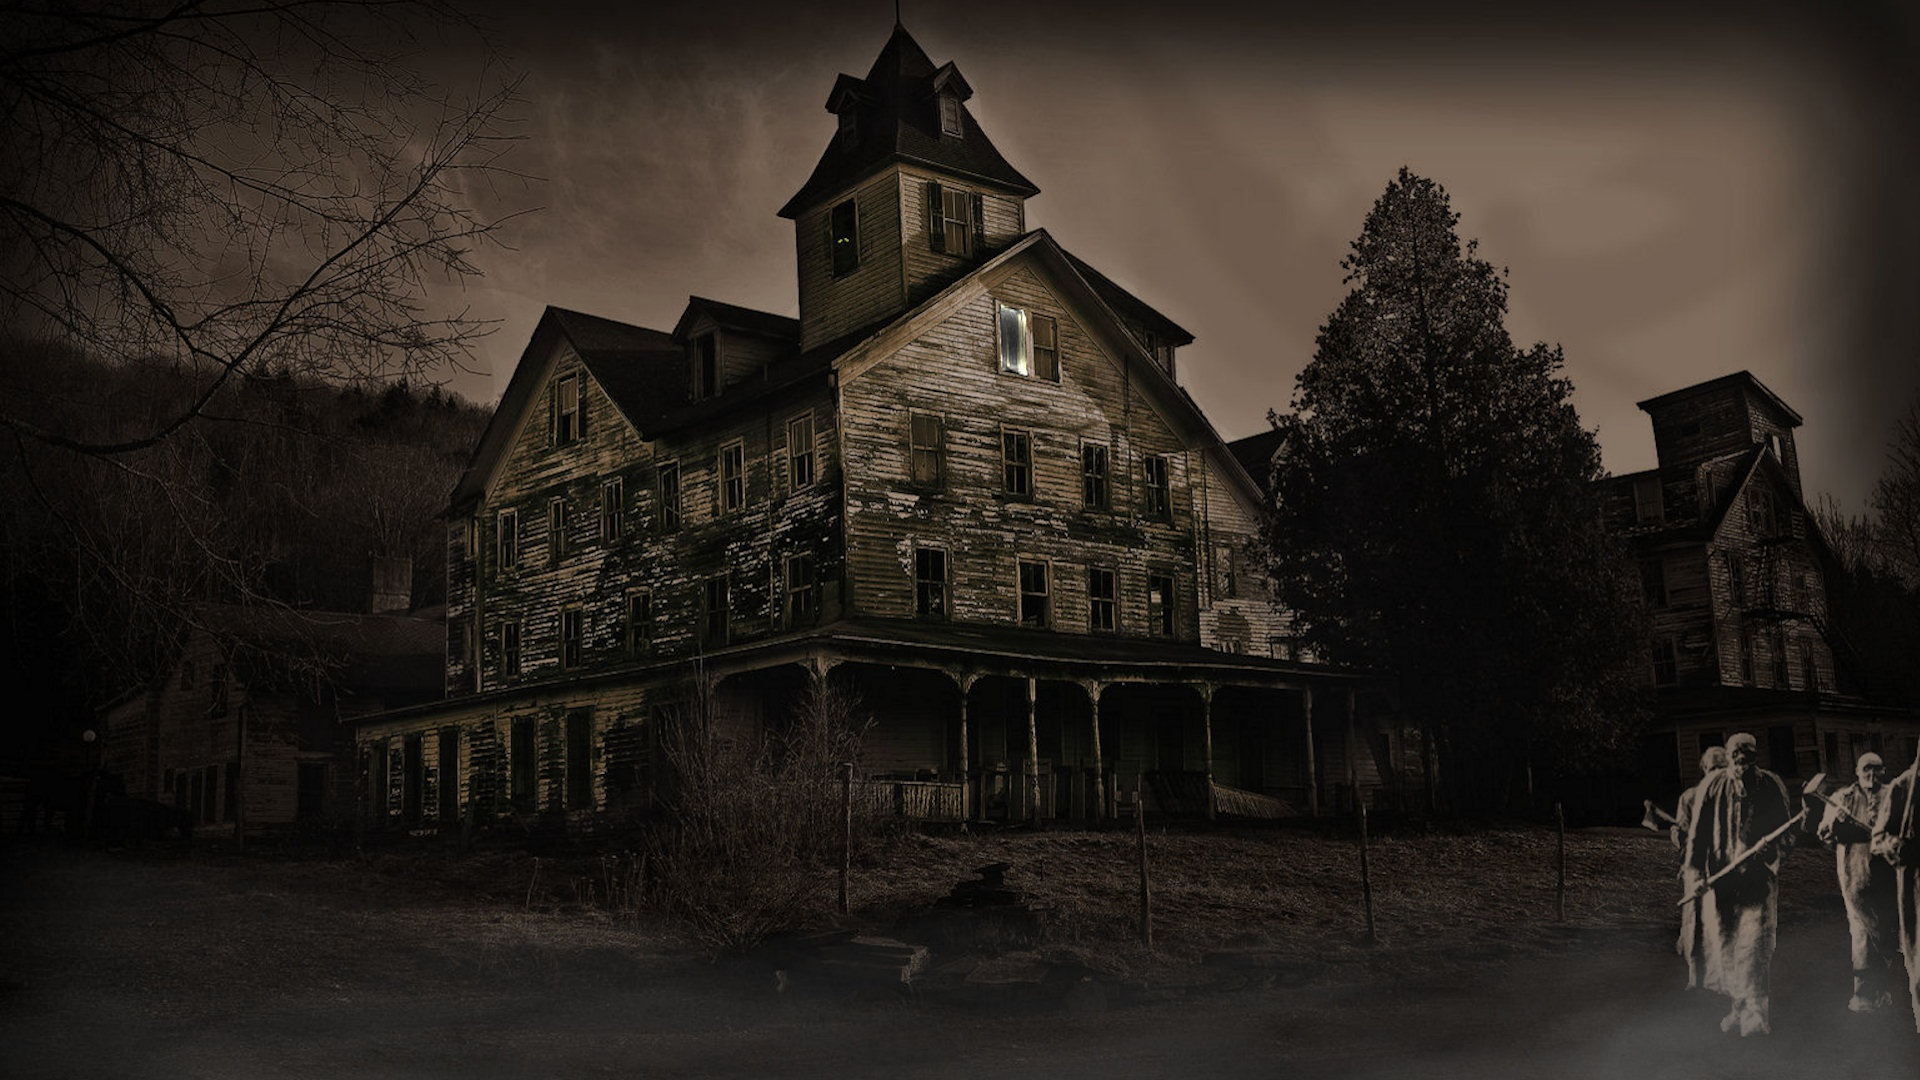 Haunted House wallpaper   793459 1920x1080